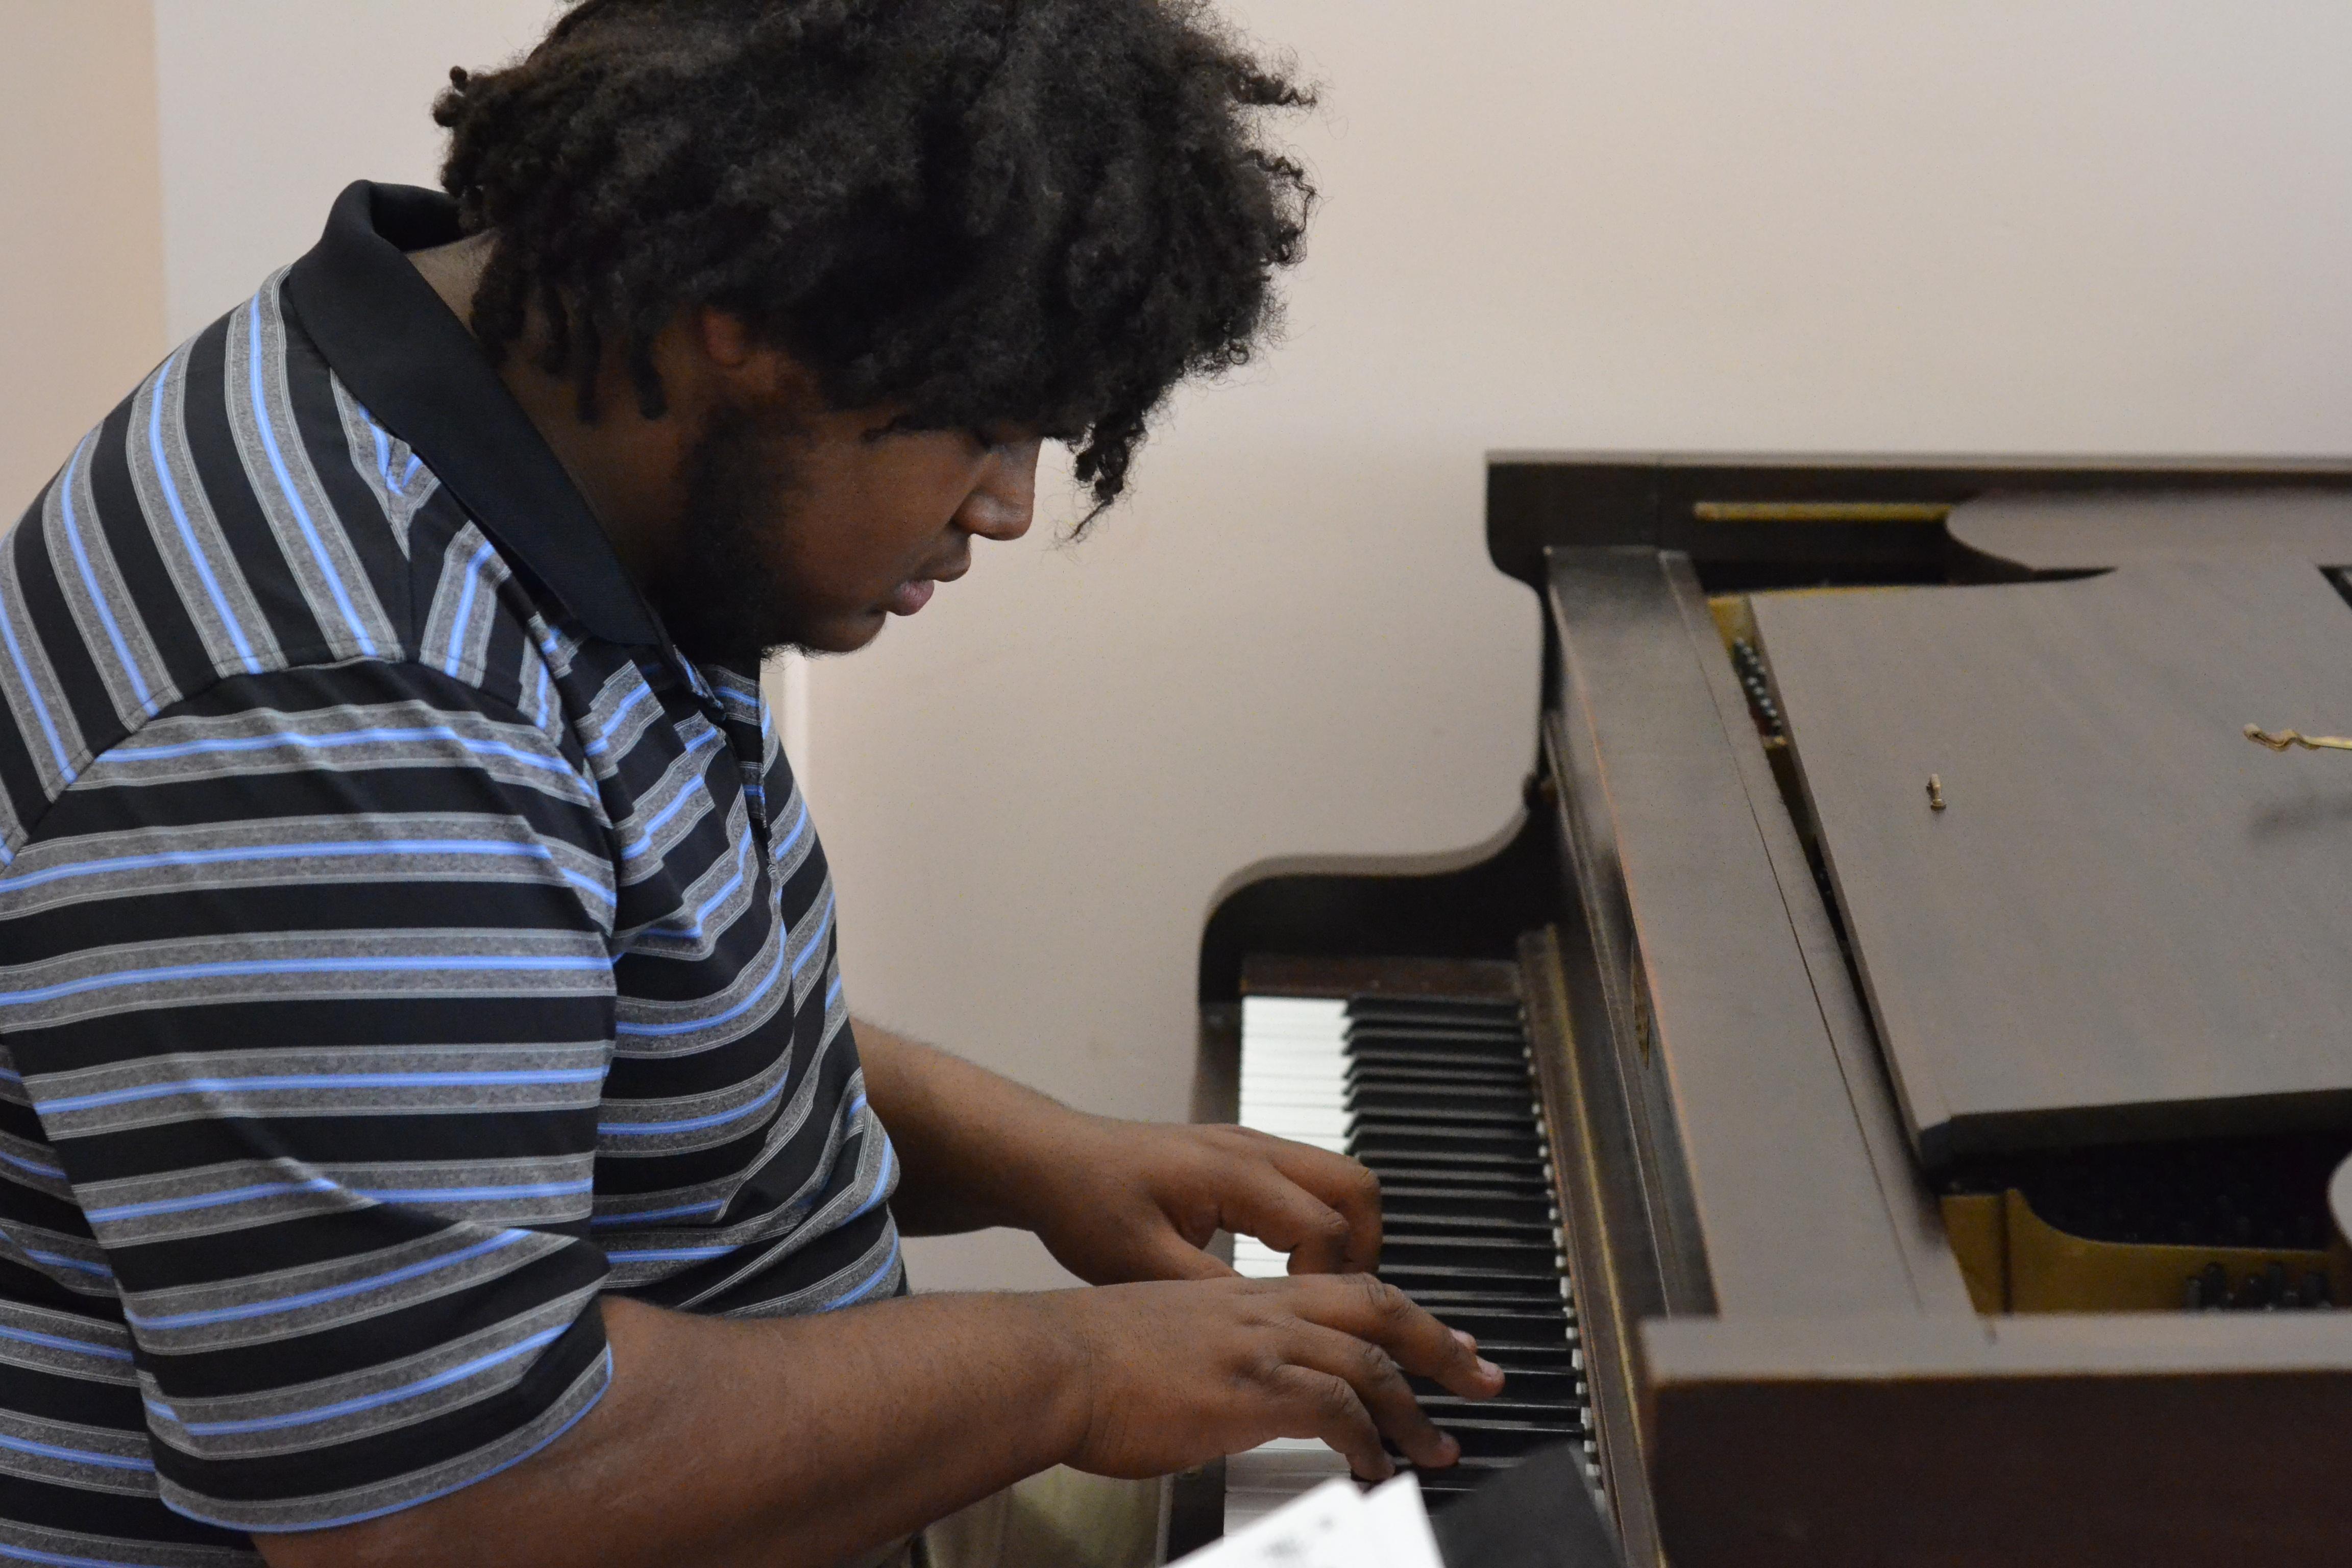 Eli Heath Jazz Trio pianist. [photo credit: Rebekah Hanlon]